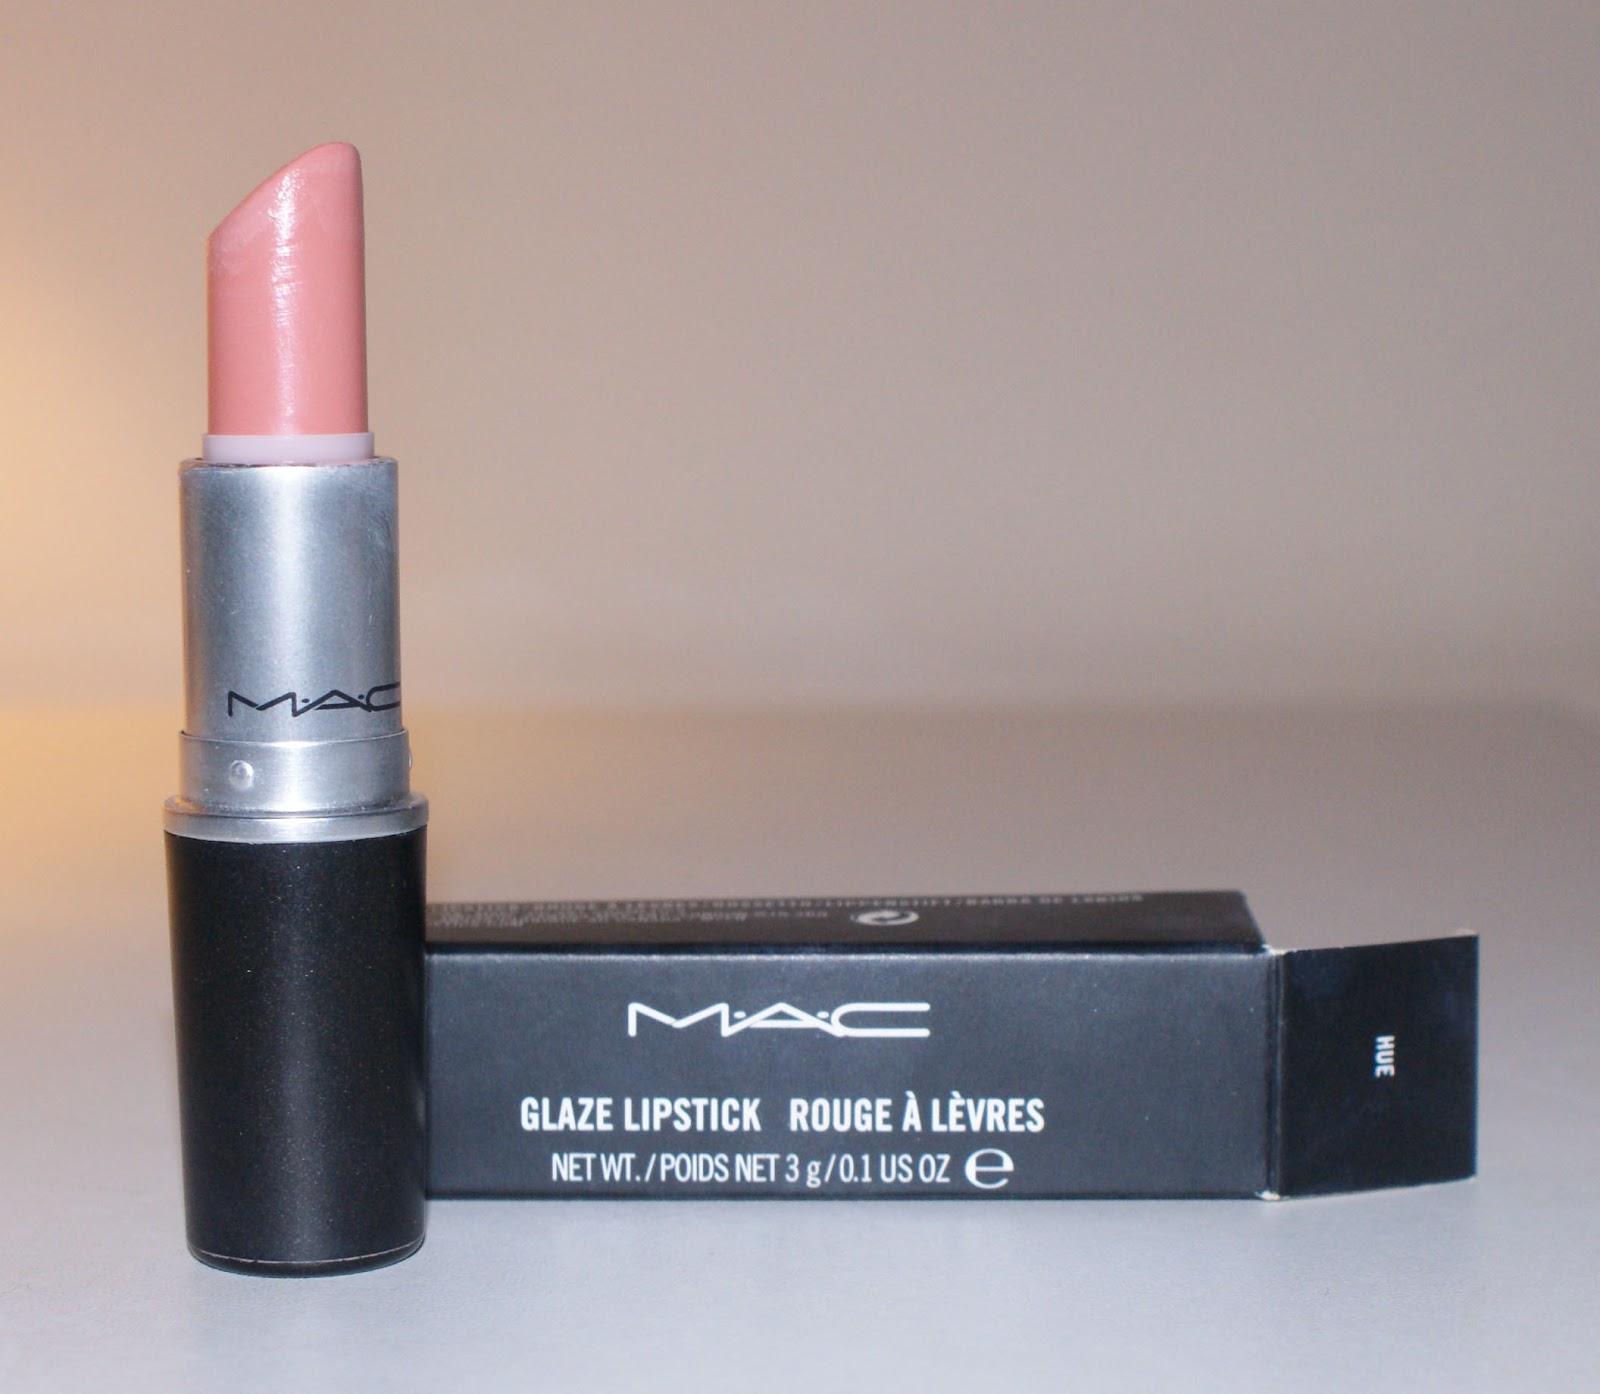 lipsticksandnotebooks hue mac lipstick review